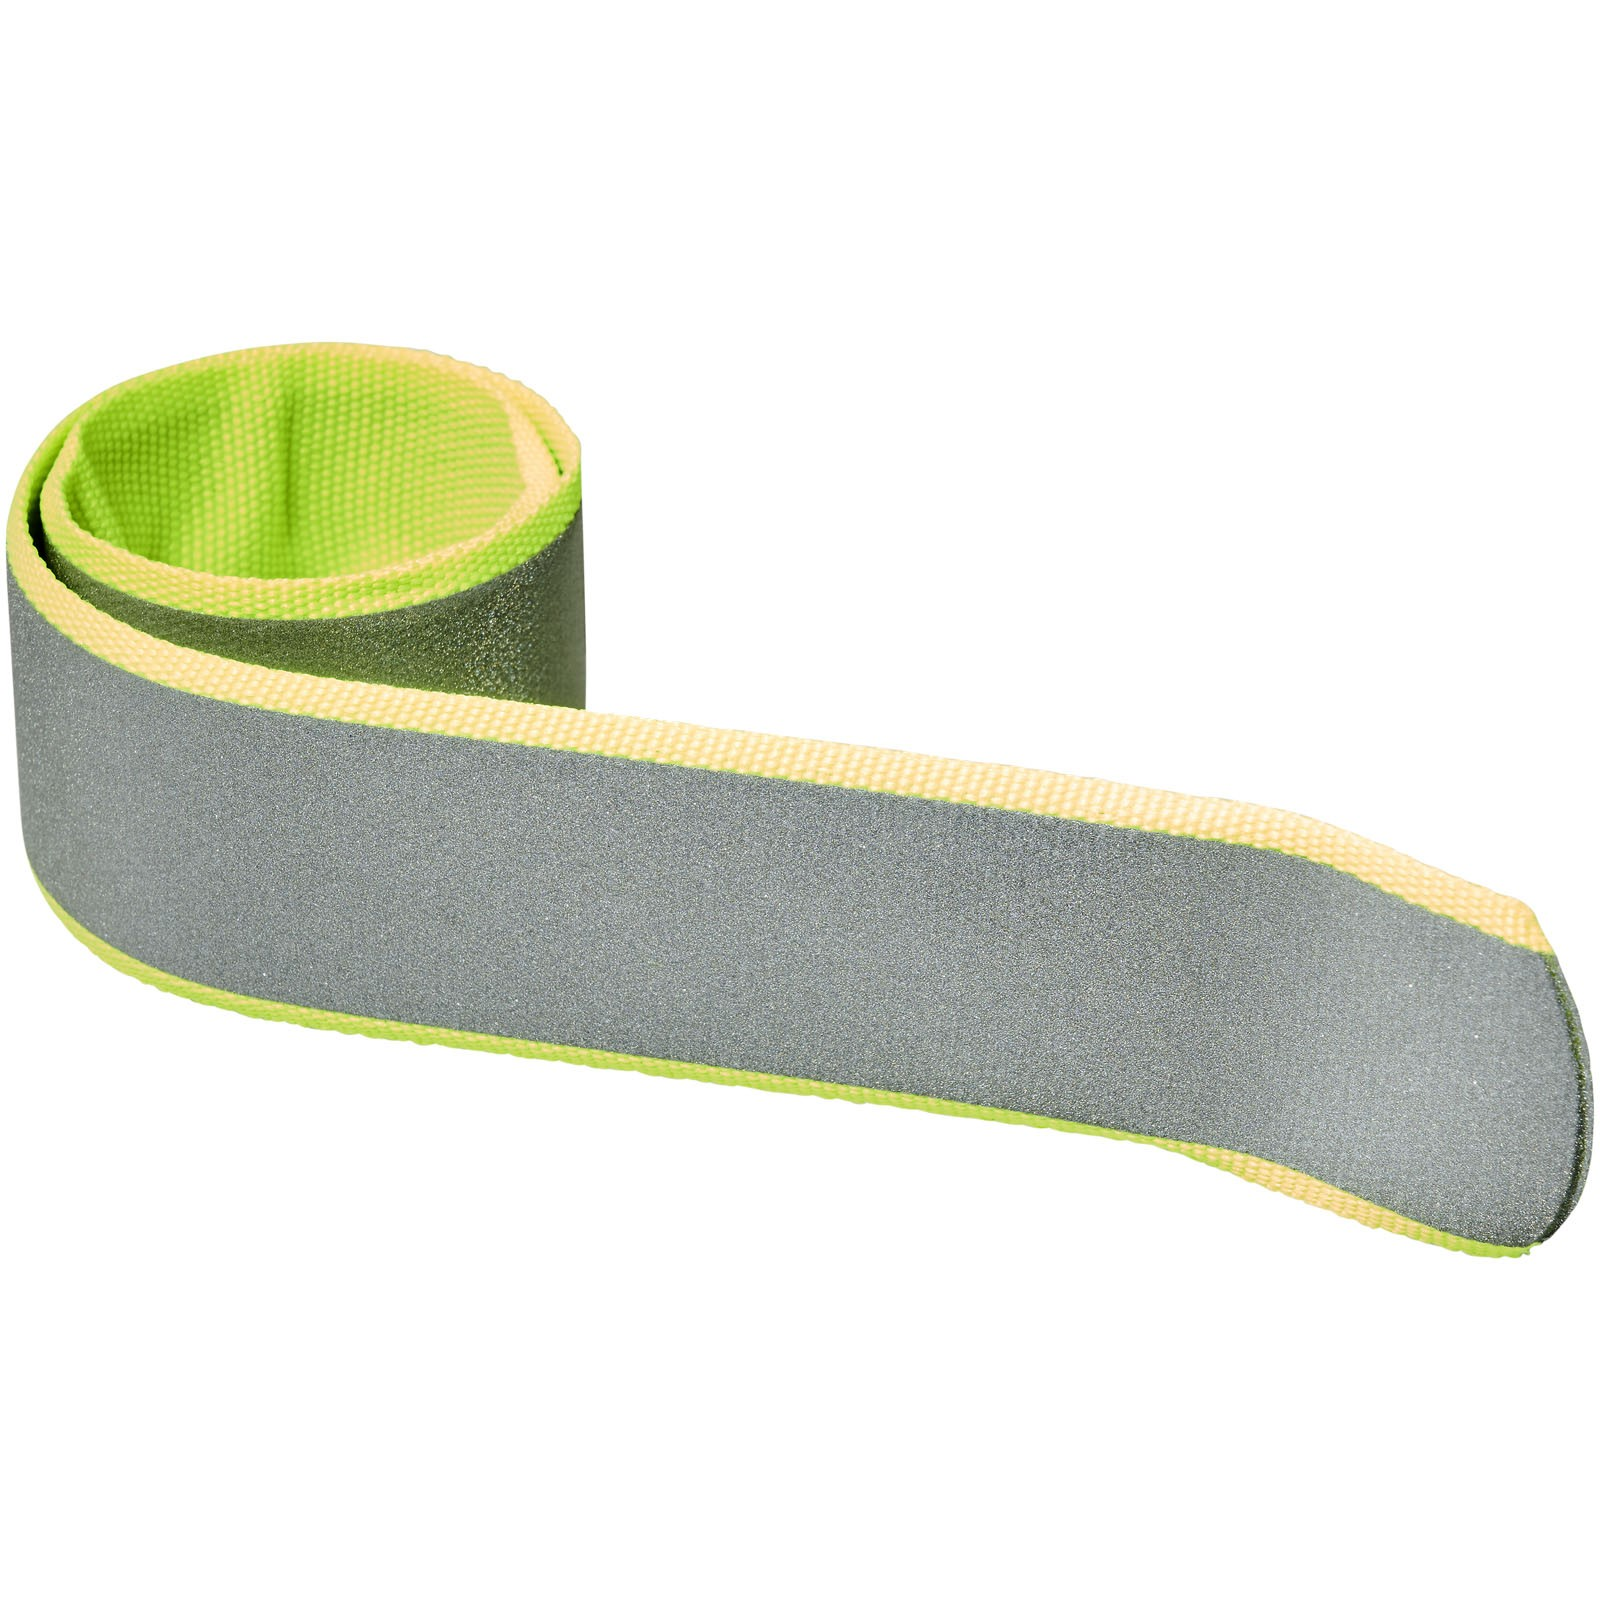 Felix reflective slap wrap - Neon yellow